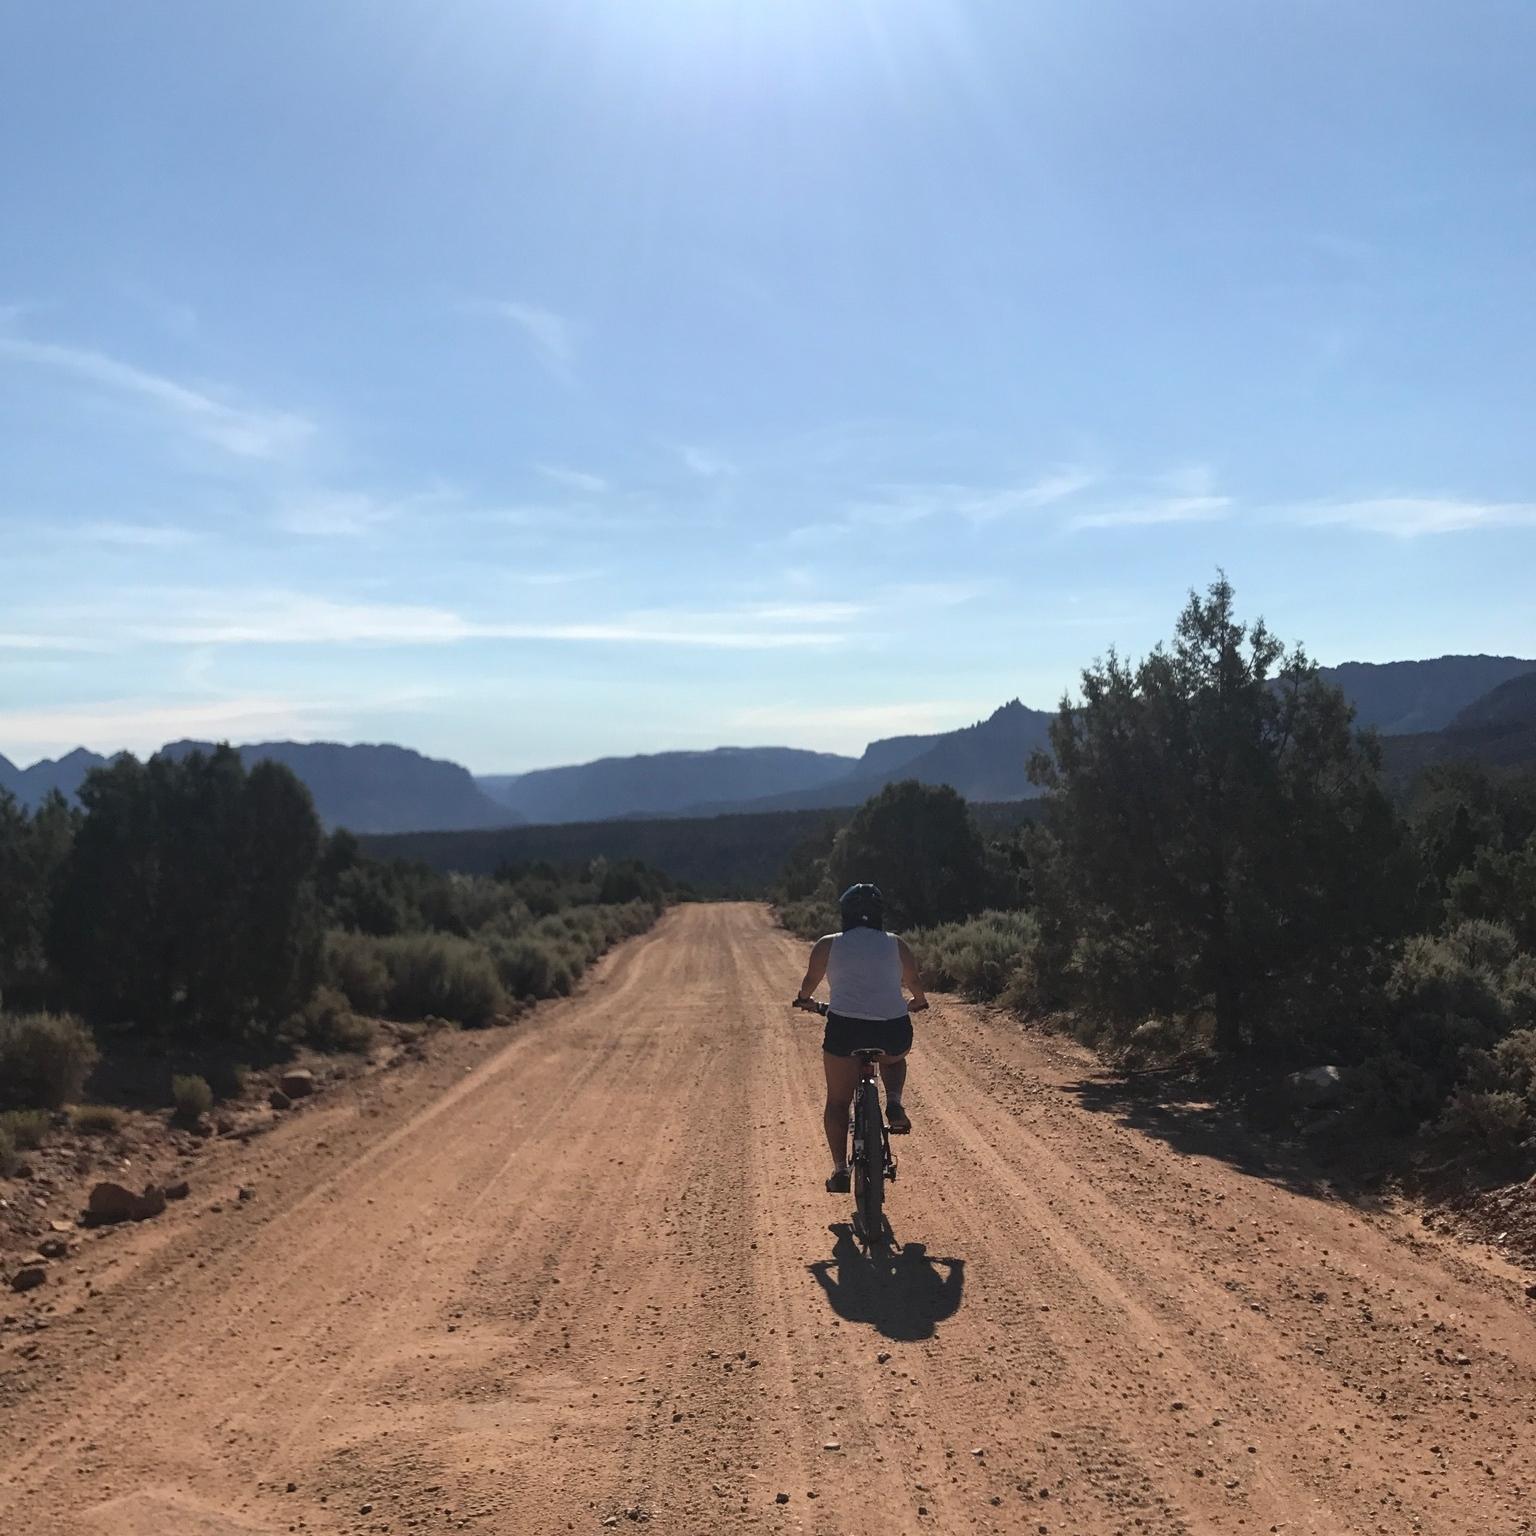 Chasqui Mom riding